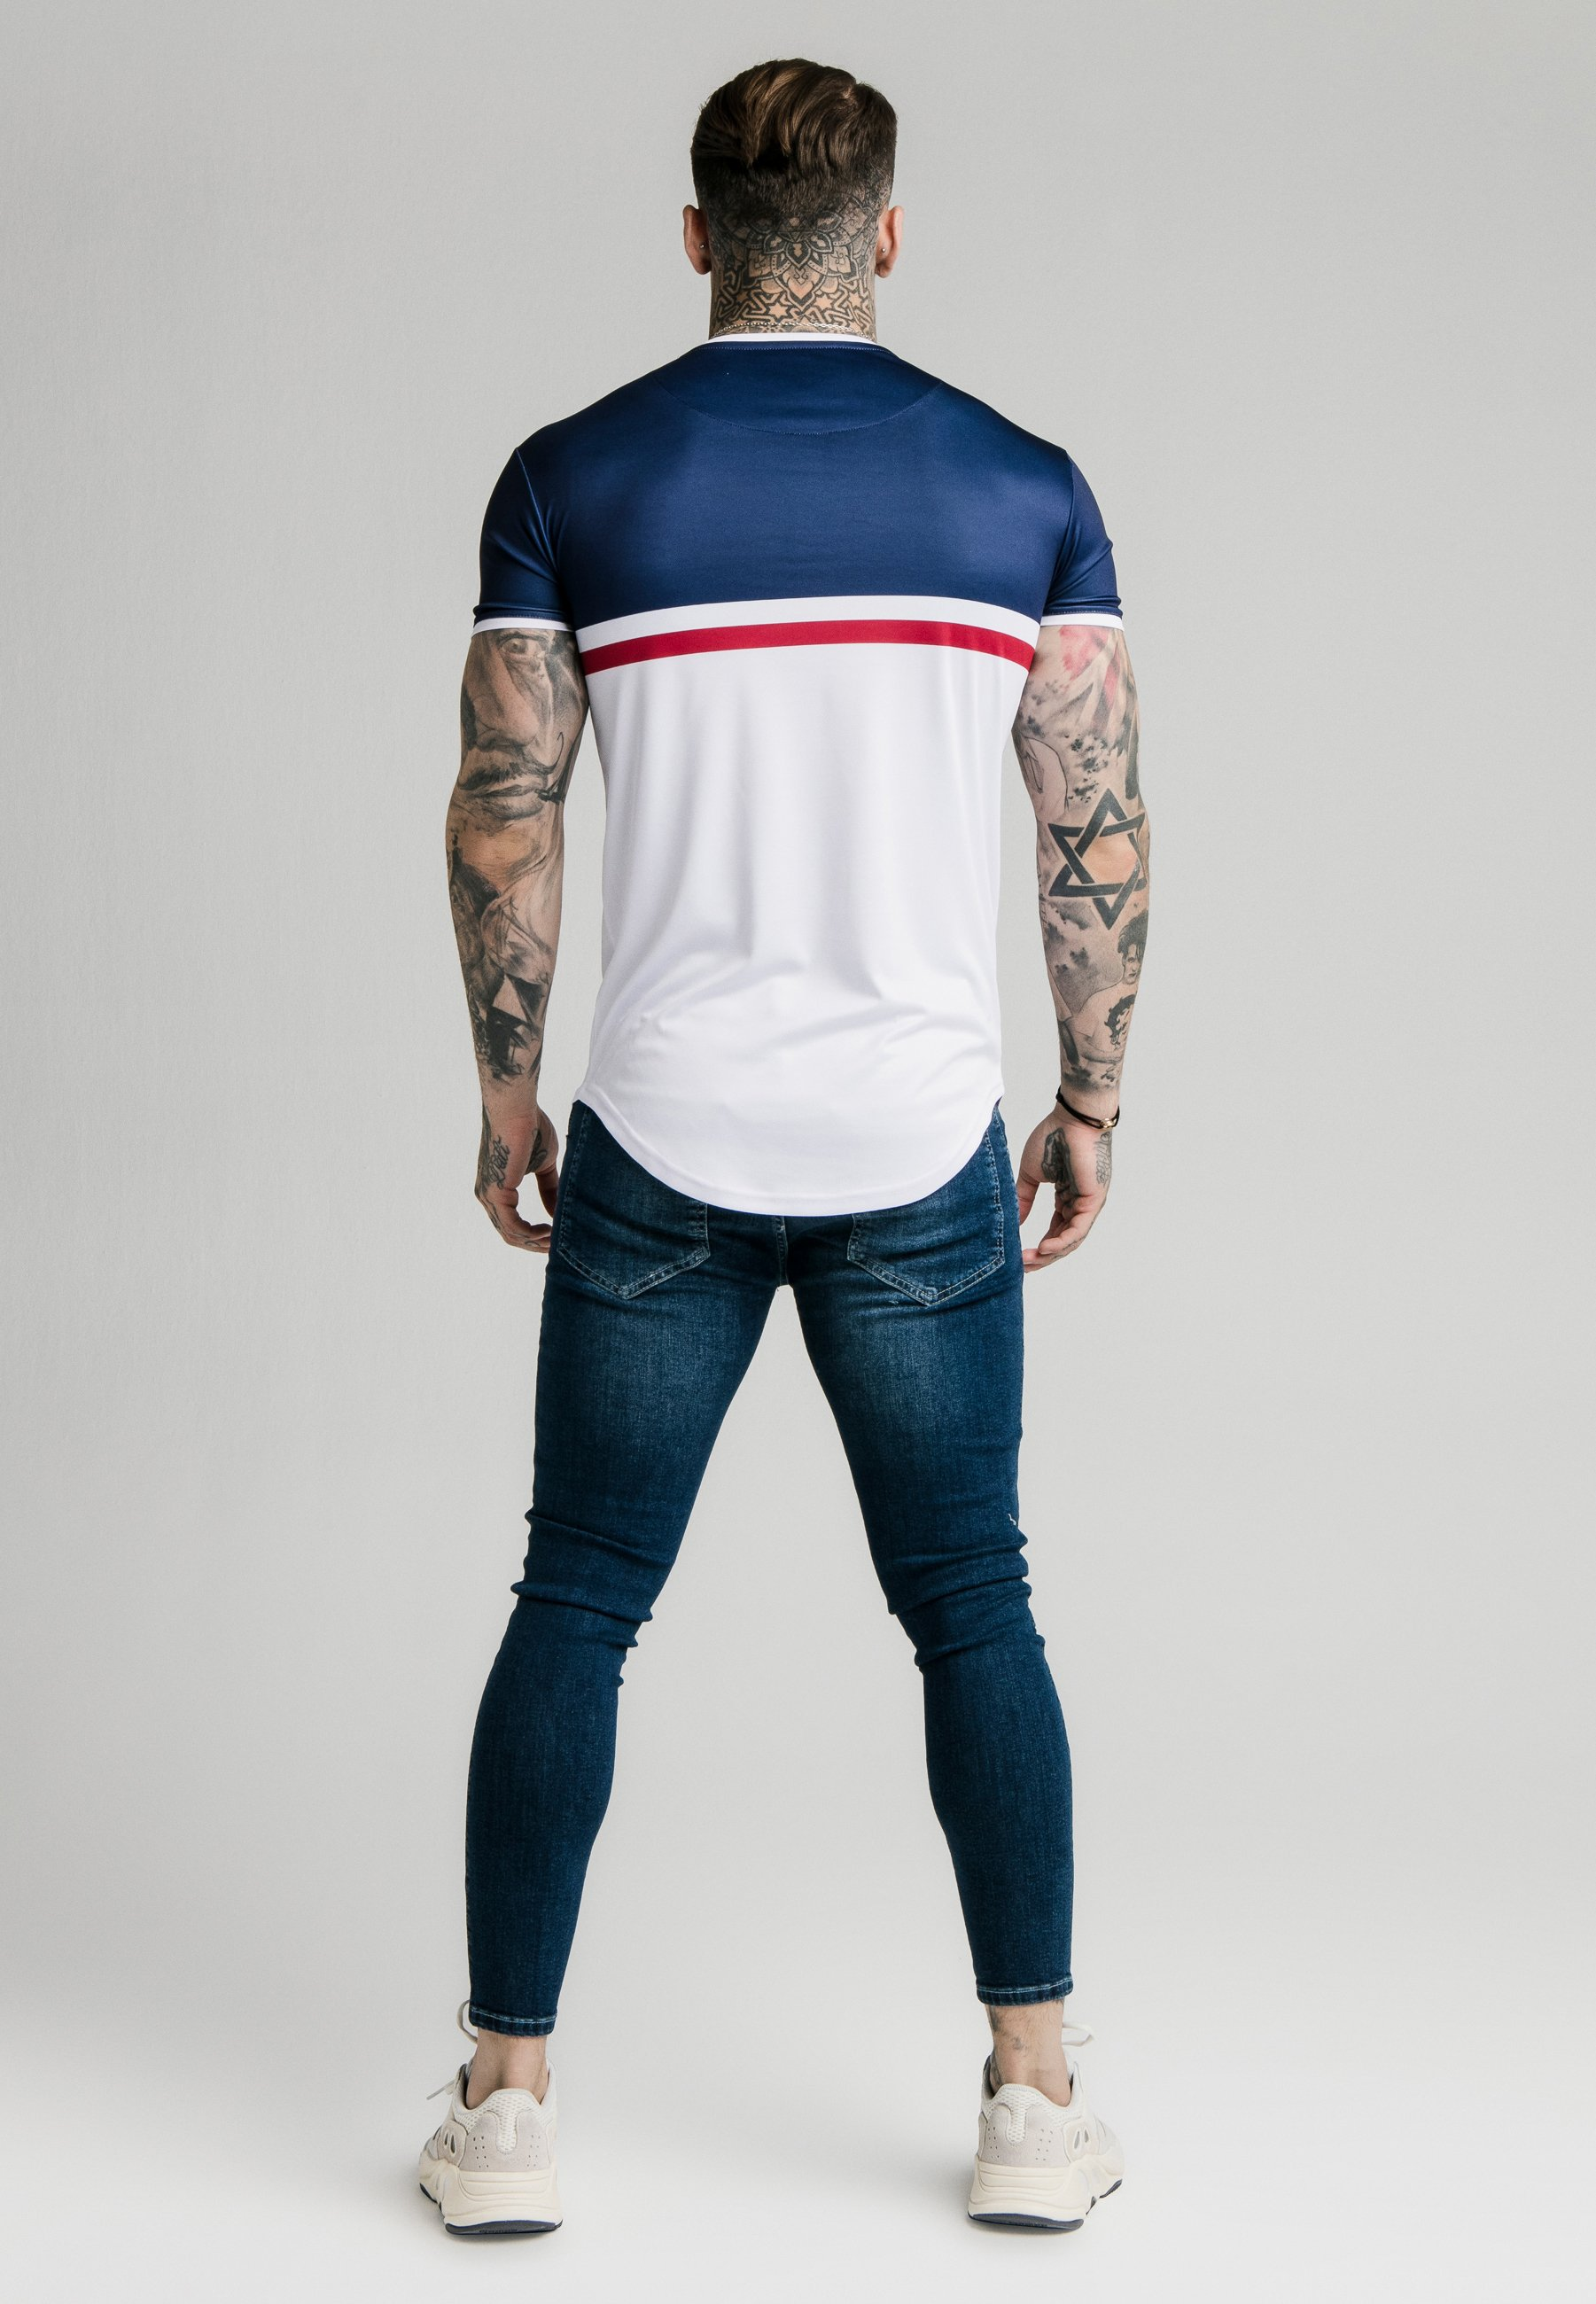 shirt Siksilk Sports TeeT red Navy Curved Hem Imprimé white clFK1JT3